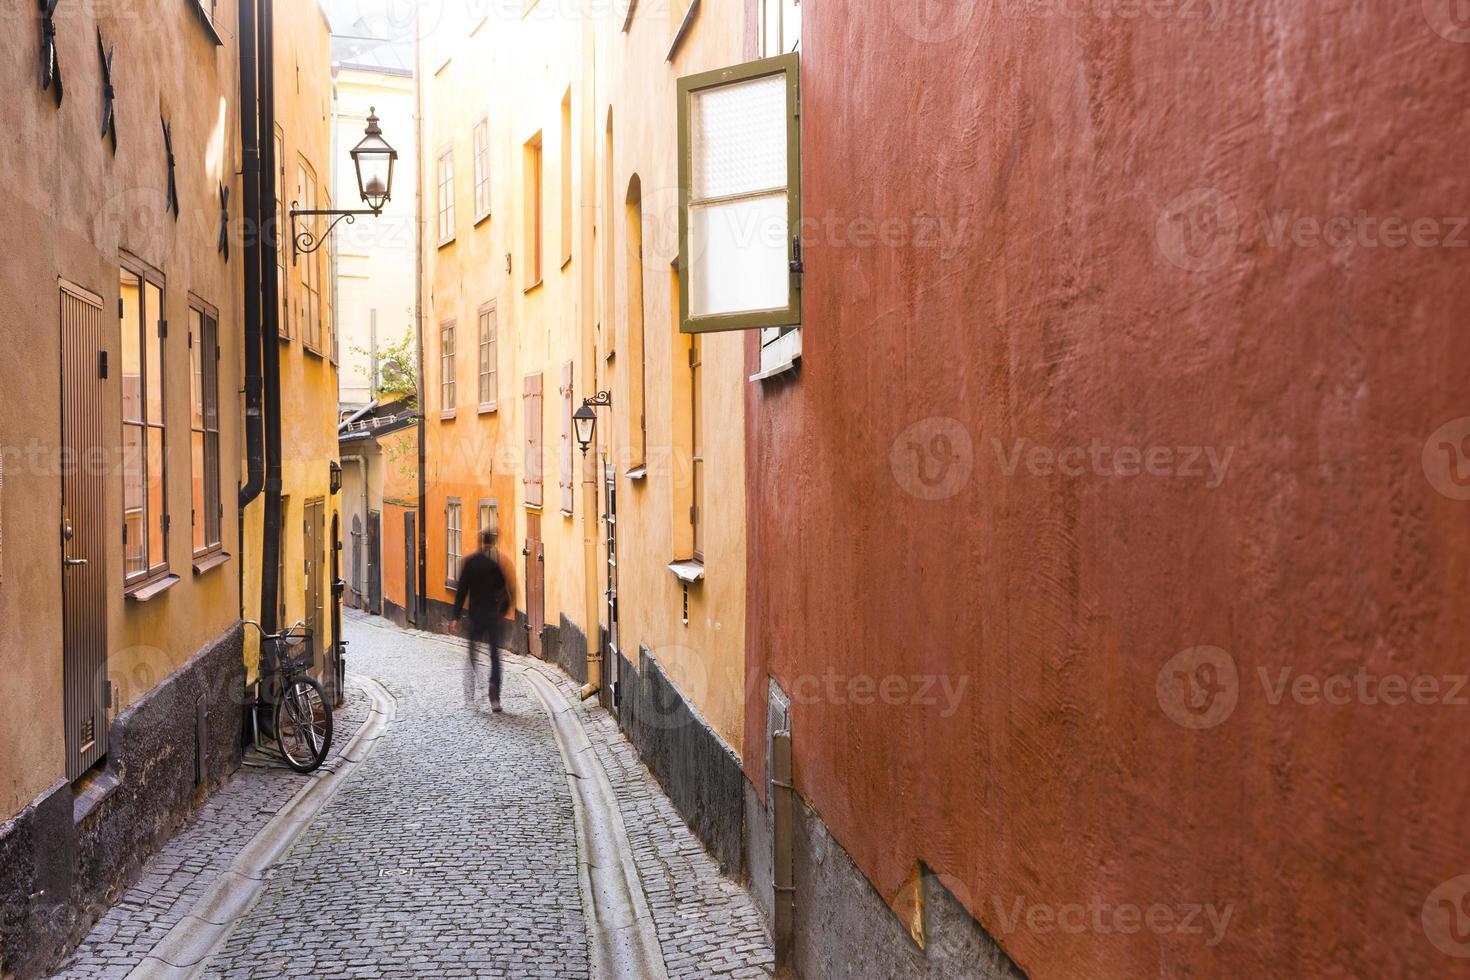 smal gata i Stockholms gamla stad foto